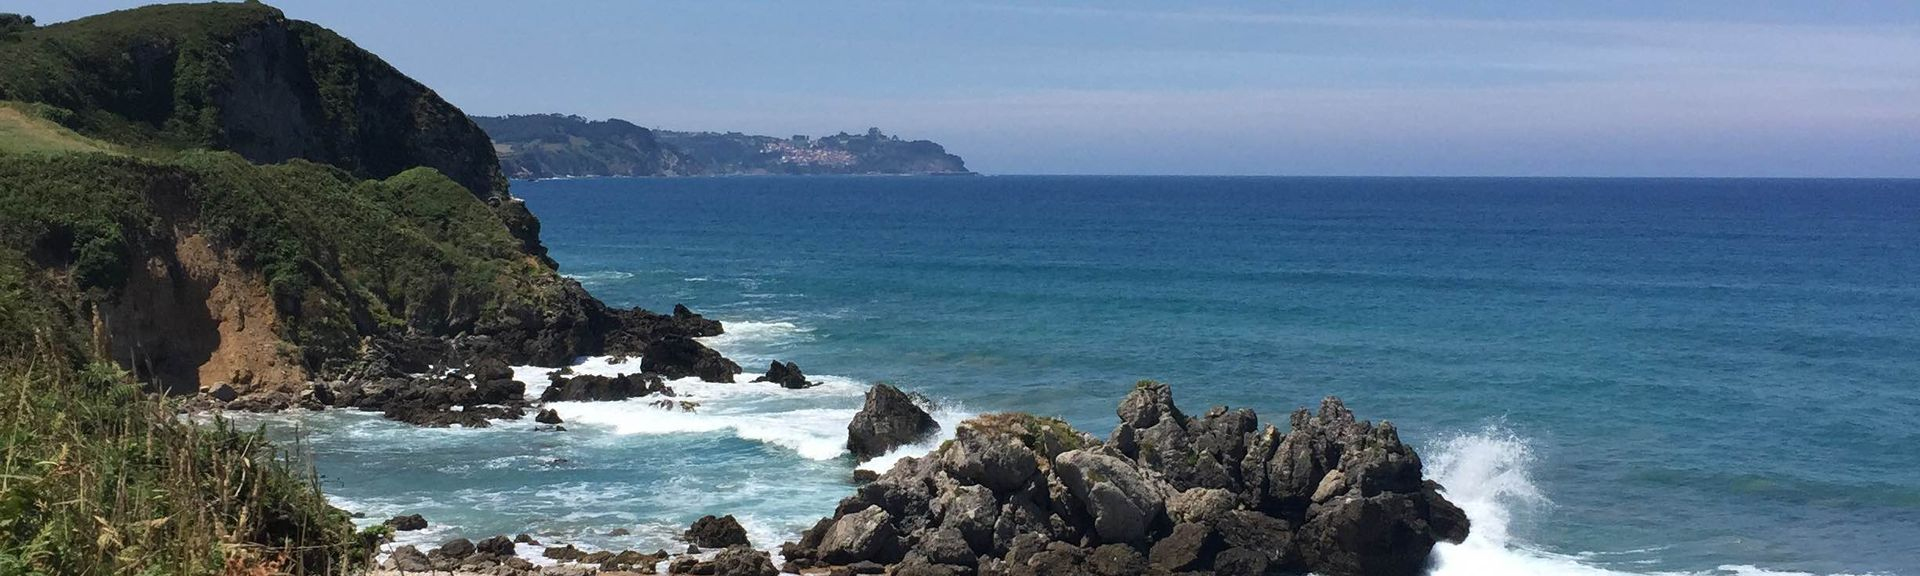 Asturias, Spanien